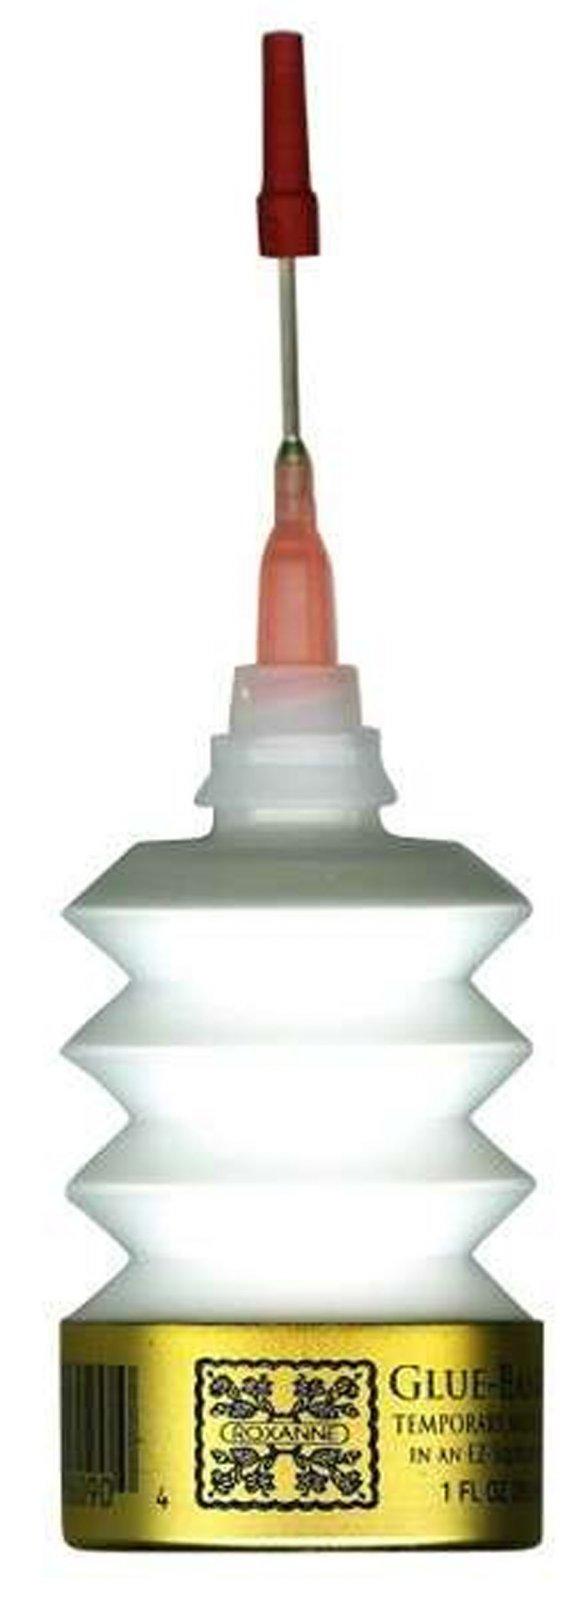 P3-109 1 oz Roxanne's Glue Baste-It